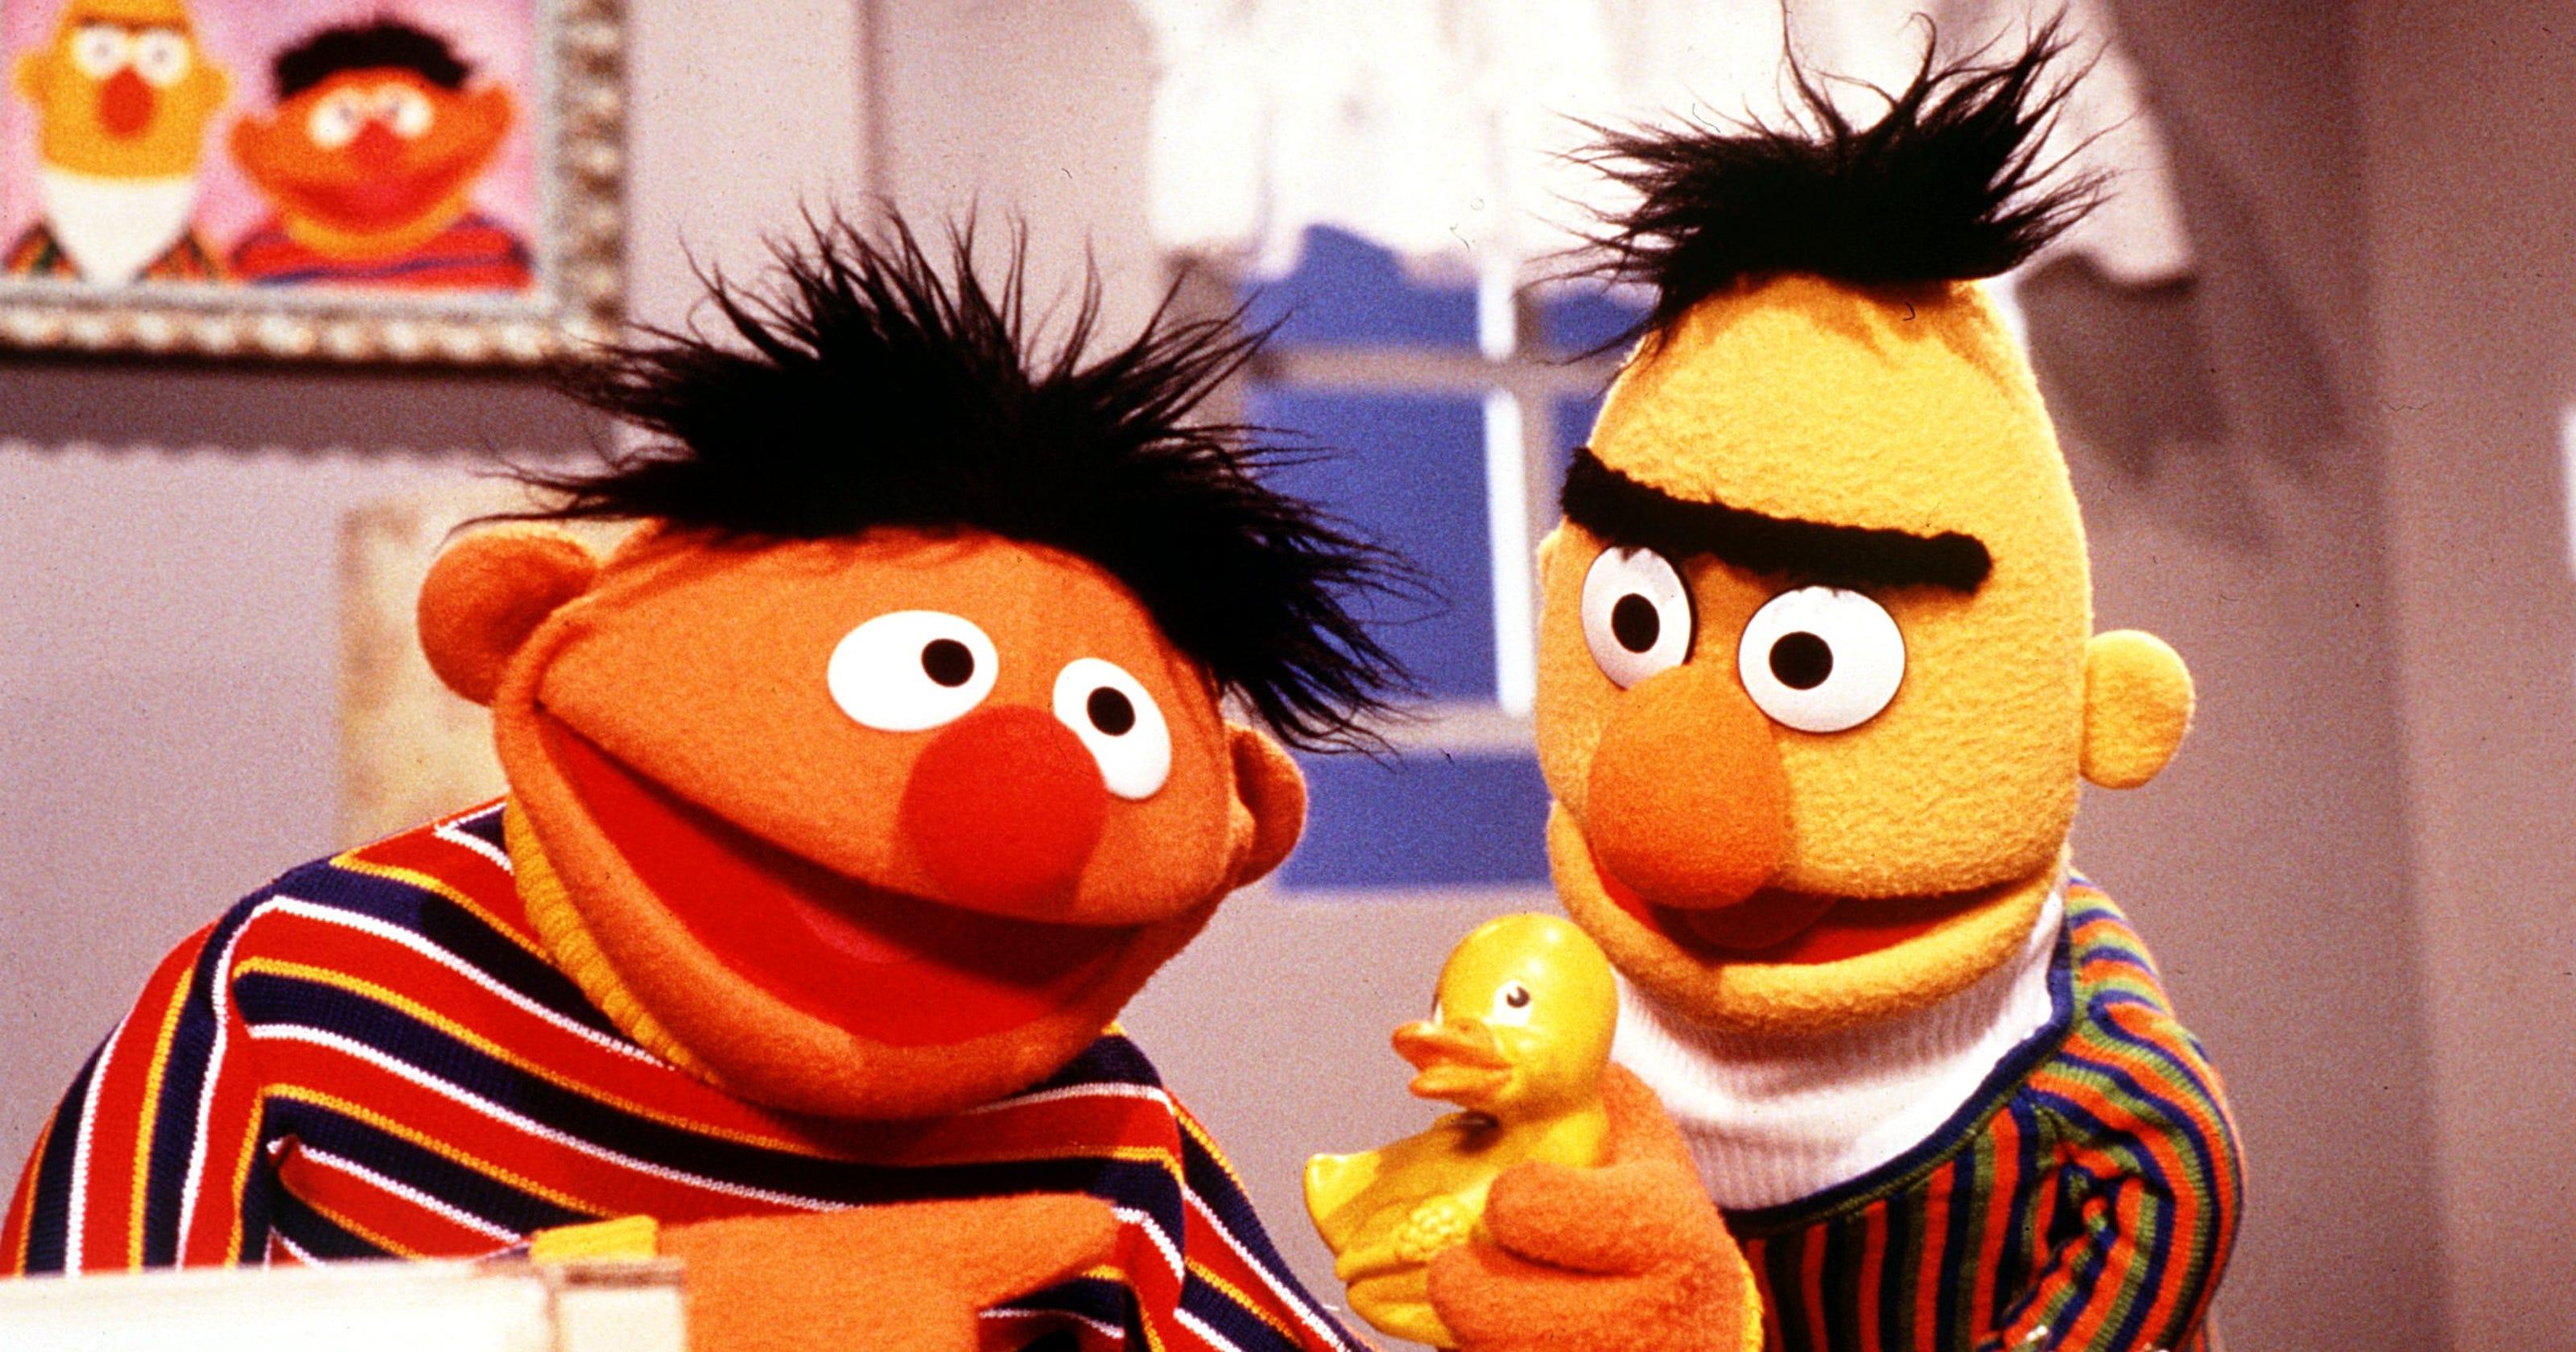 Sesame Street' denies writer's claim that Bert and Ernie are gay